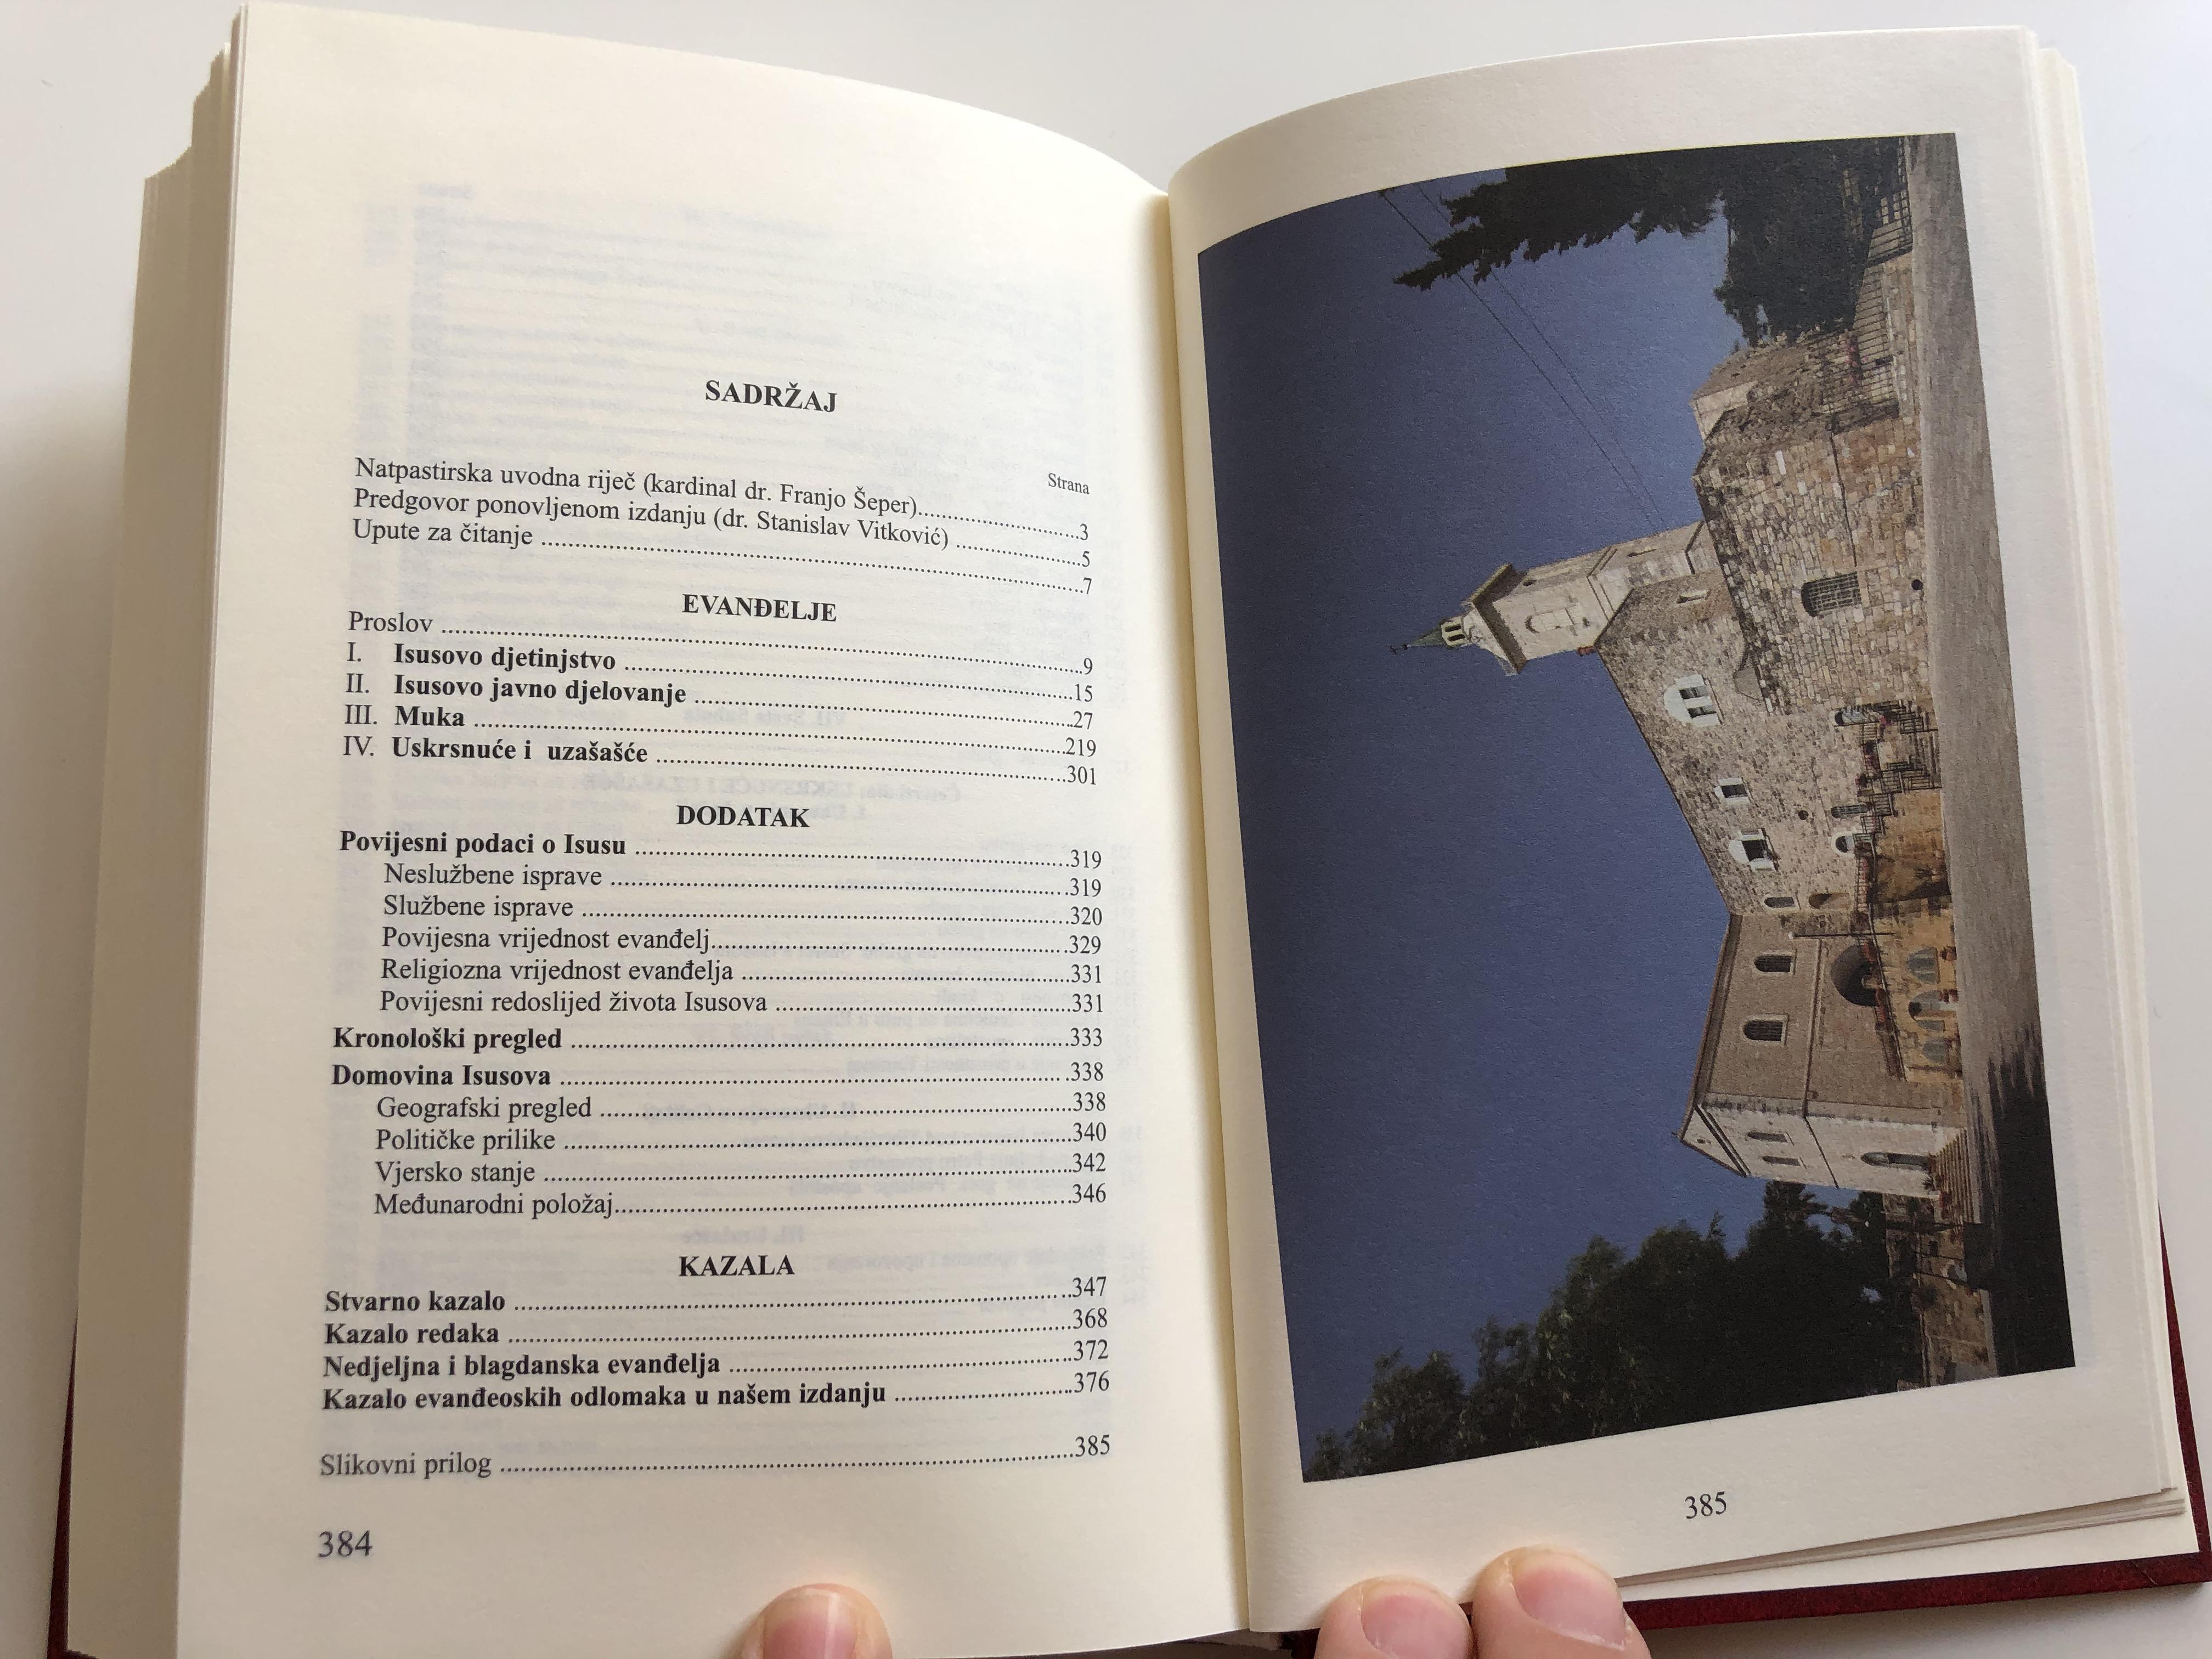 evan-elje-re-ima-etvorice-evan-elista-croatian-language-edition-of-il-vangelo-14.jpg